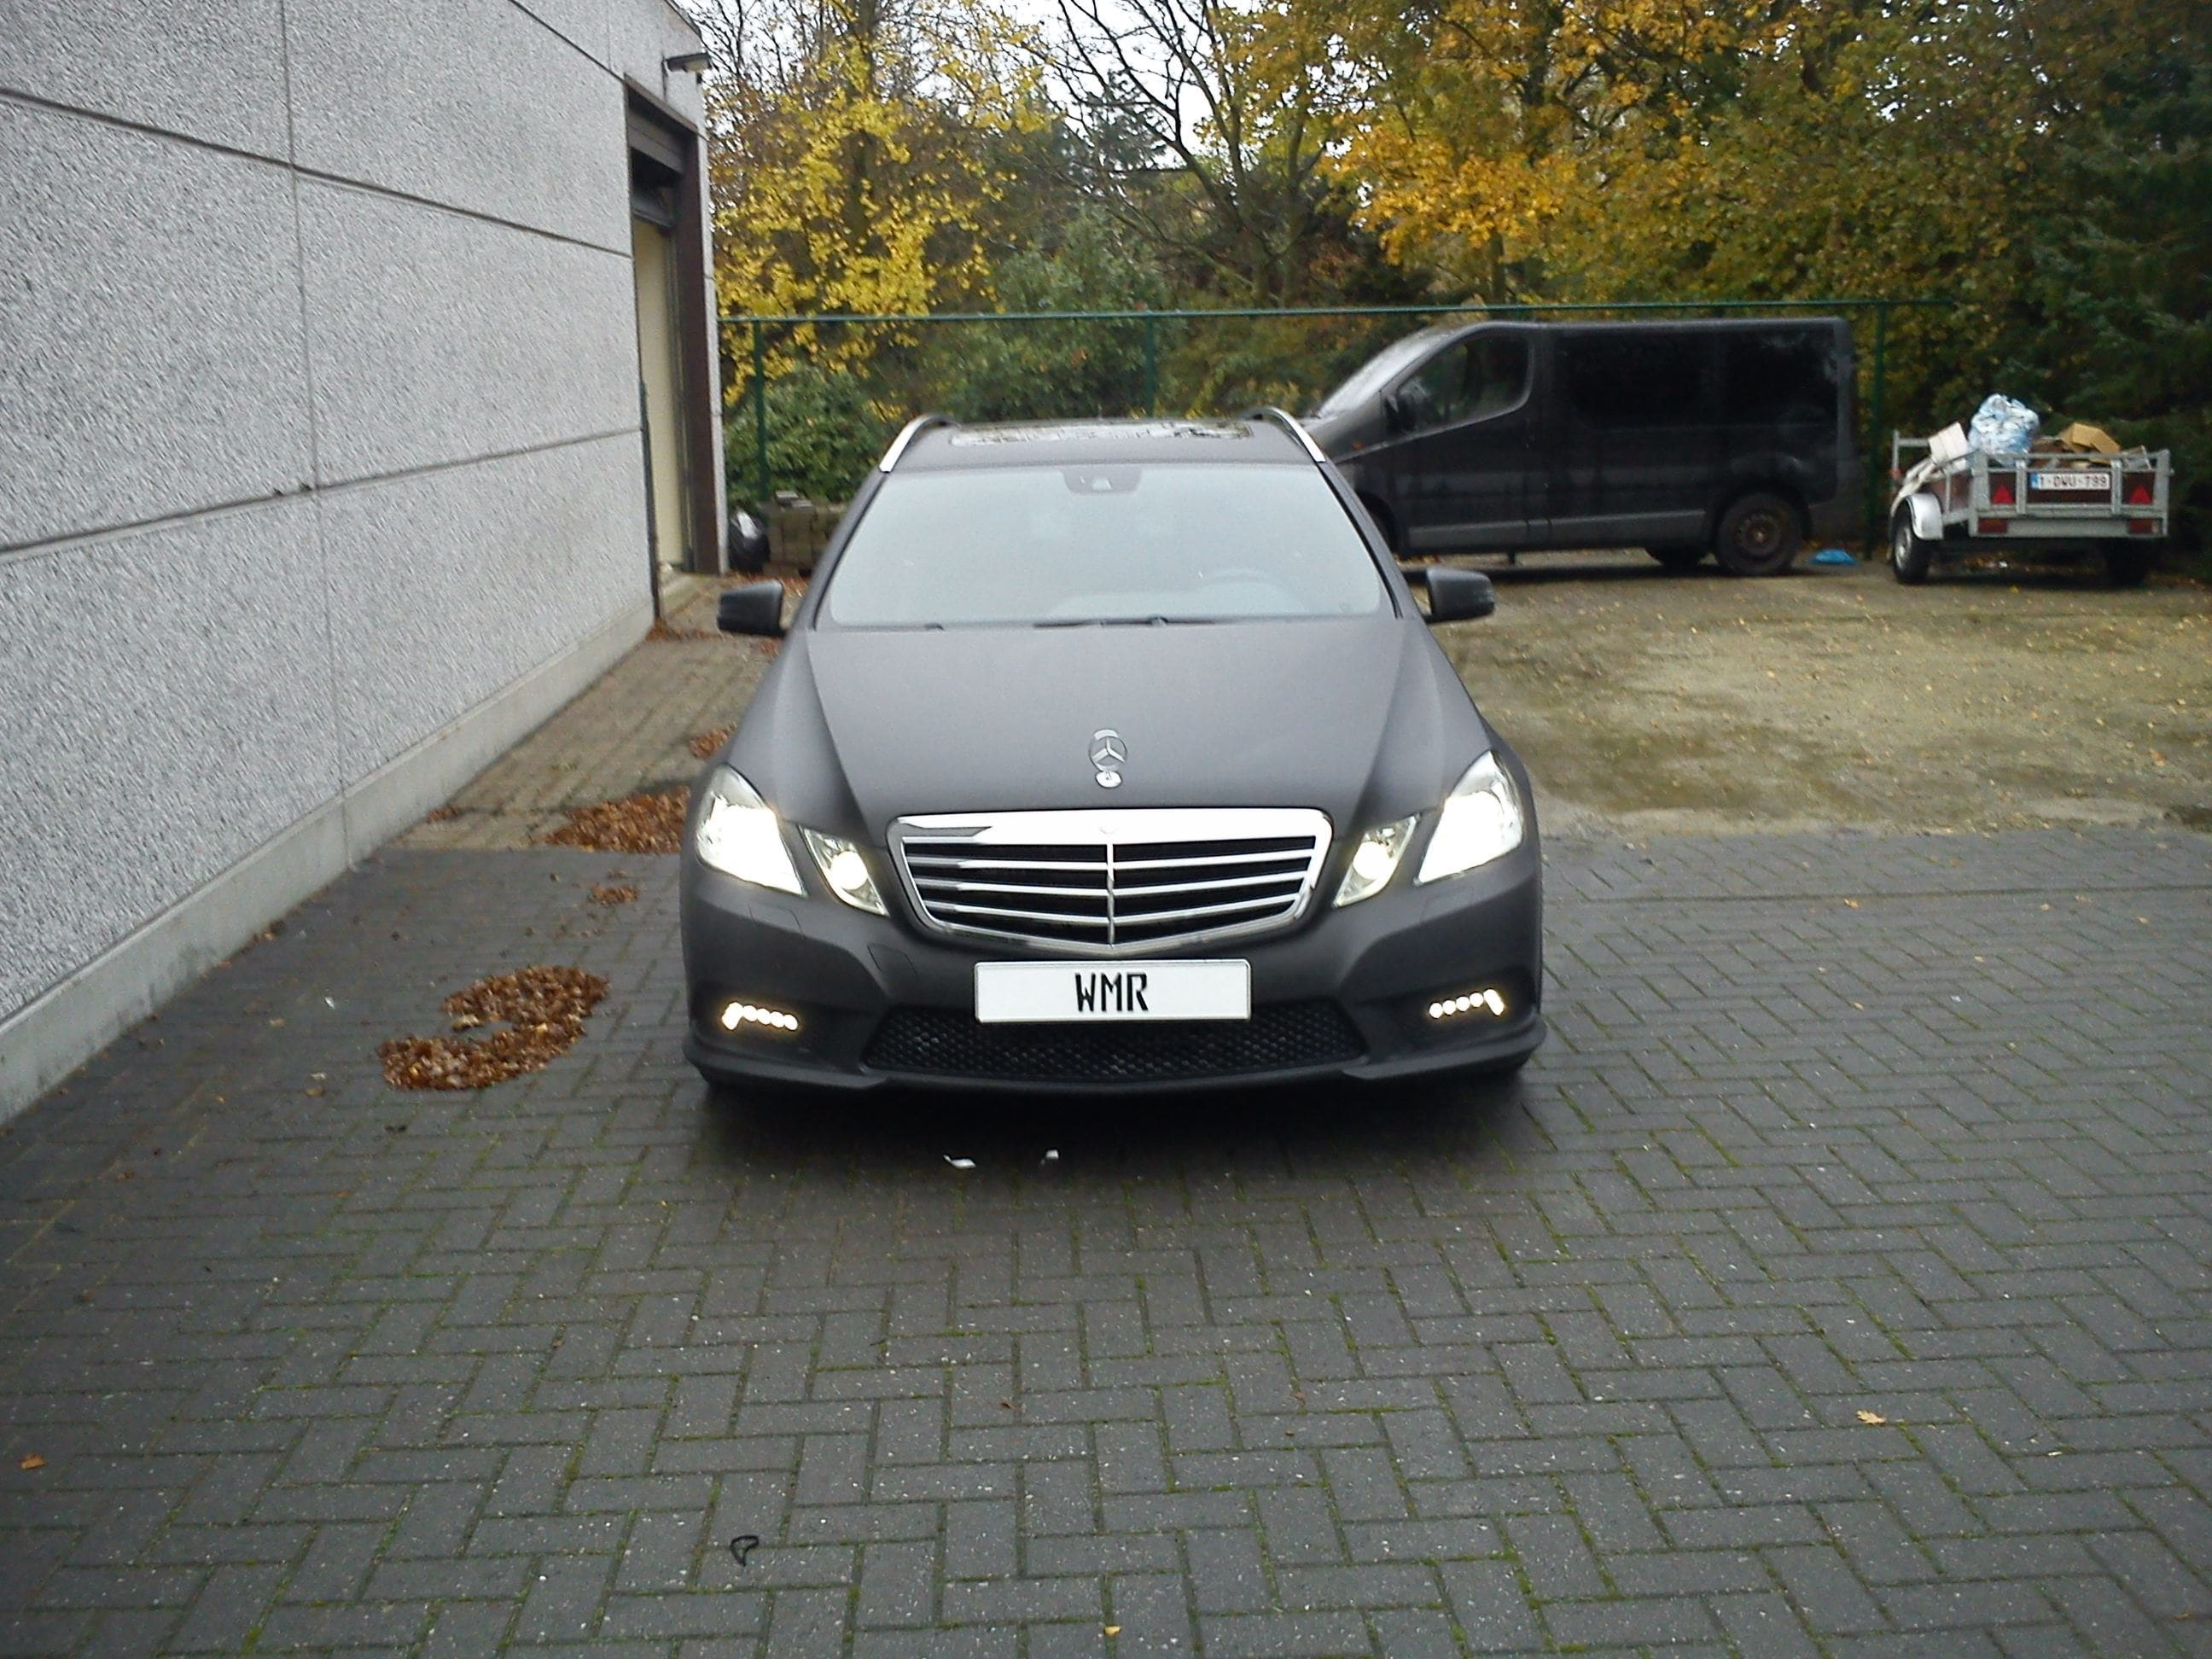 Mercedes E320 met Mat Zwarte Wrap, Carwrapping door Wrapmyride.nu Foto-nr:6225, ©2021